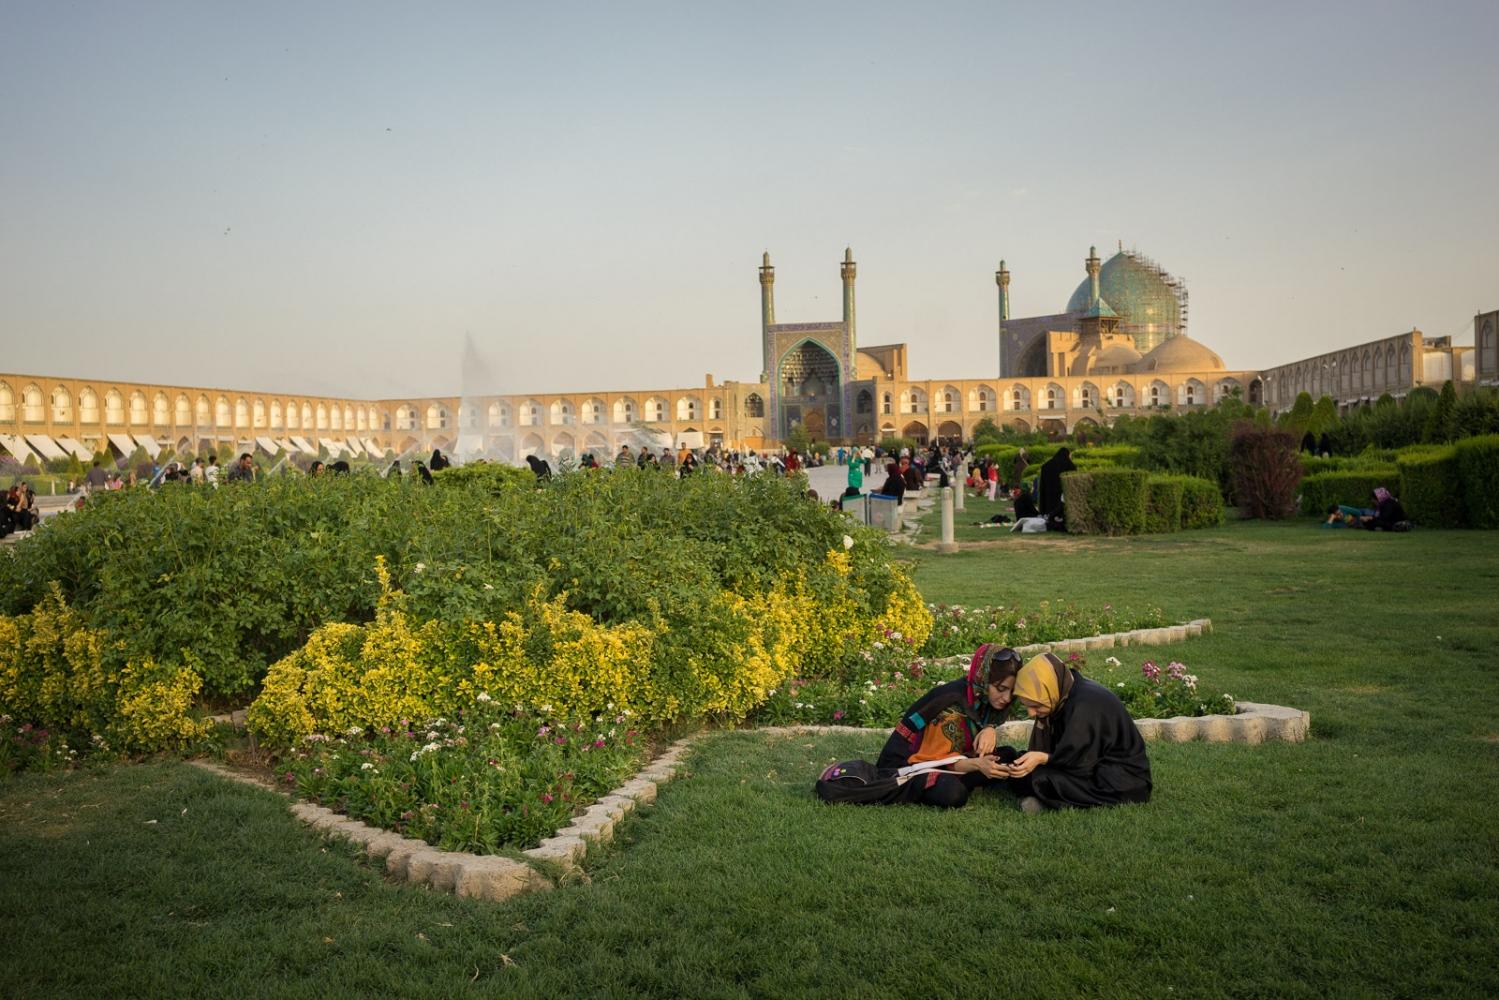 Art and Documentary Photography - Loading 022-iran_consumerism.jpg